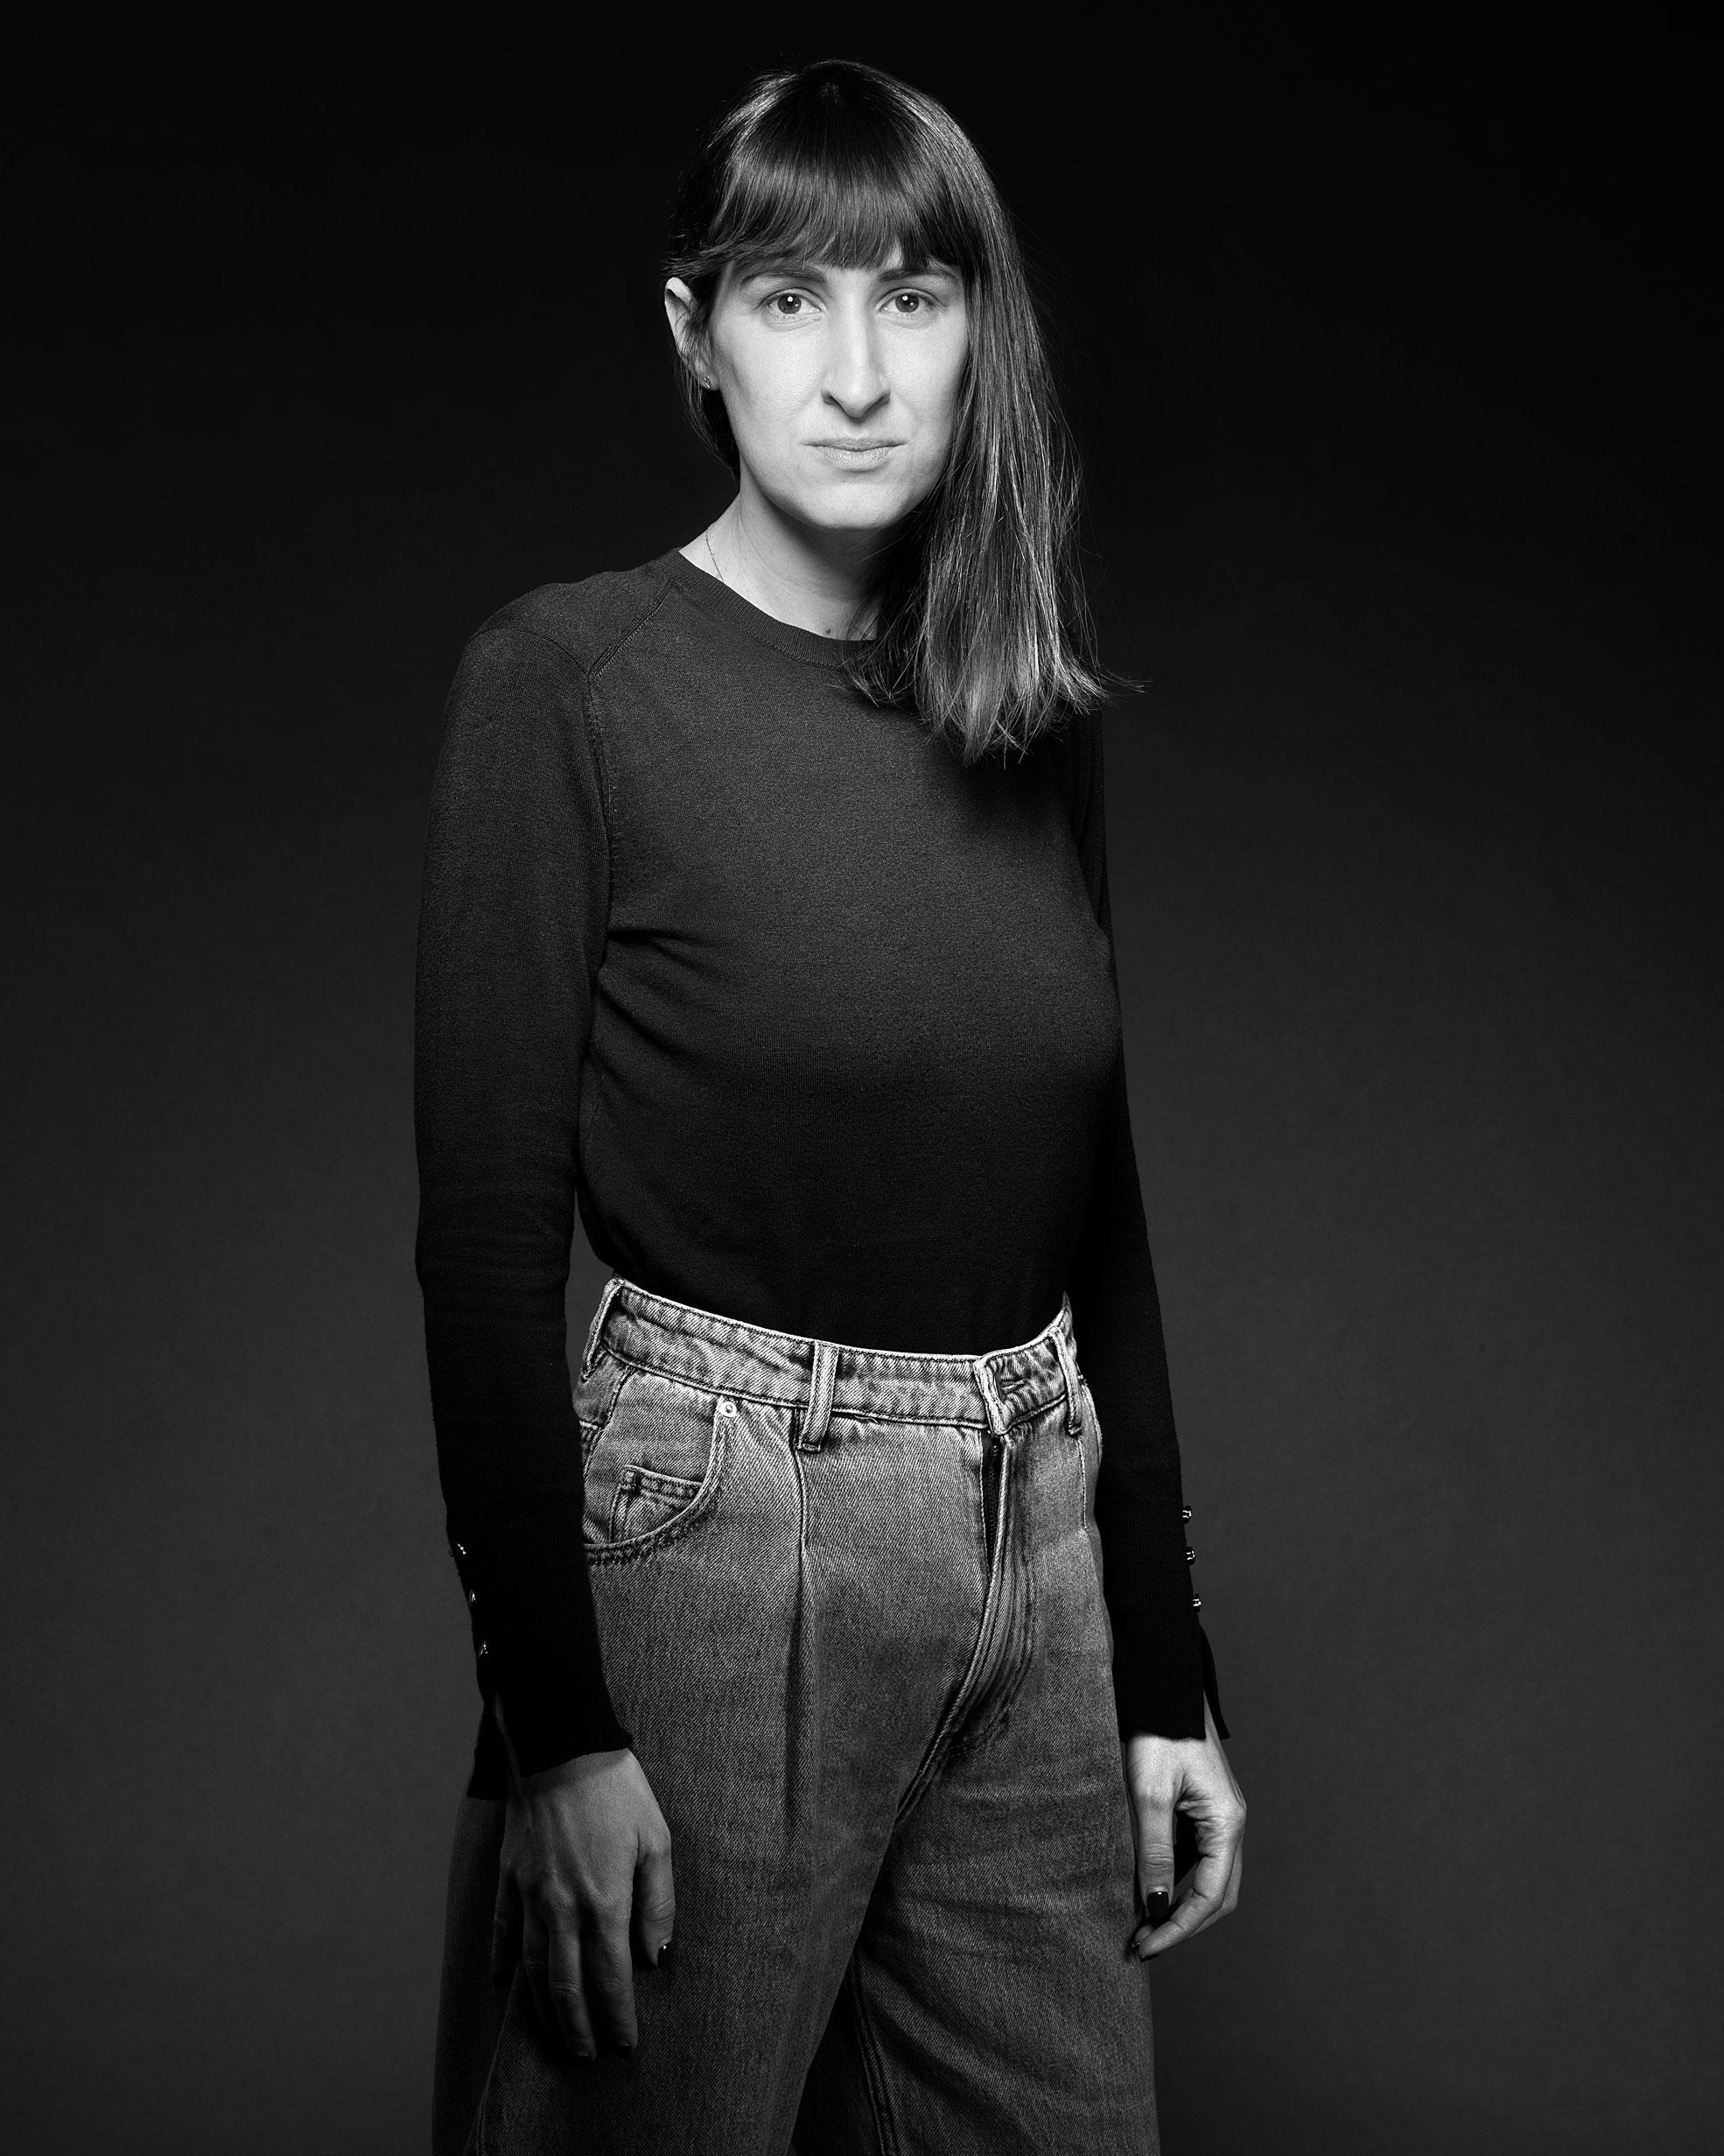 Portrait of Roberta Borrelli of Make Your Home Photographer Maria Teresa Furnari